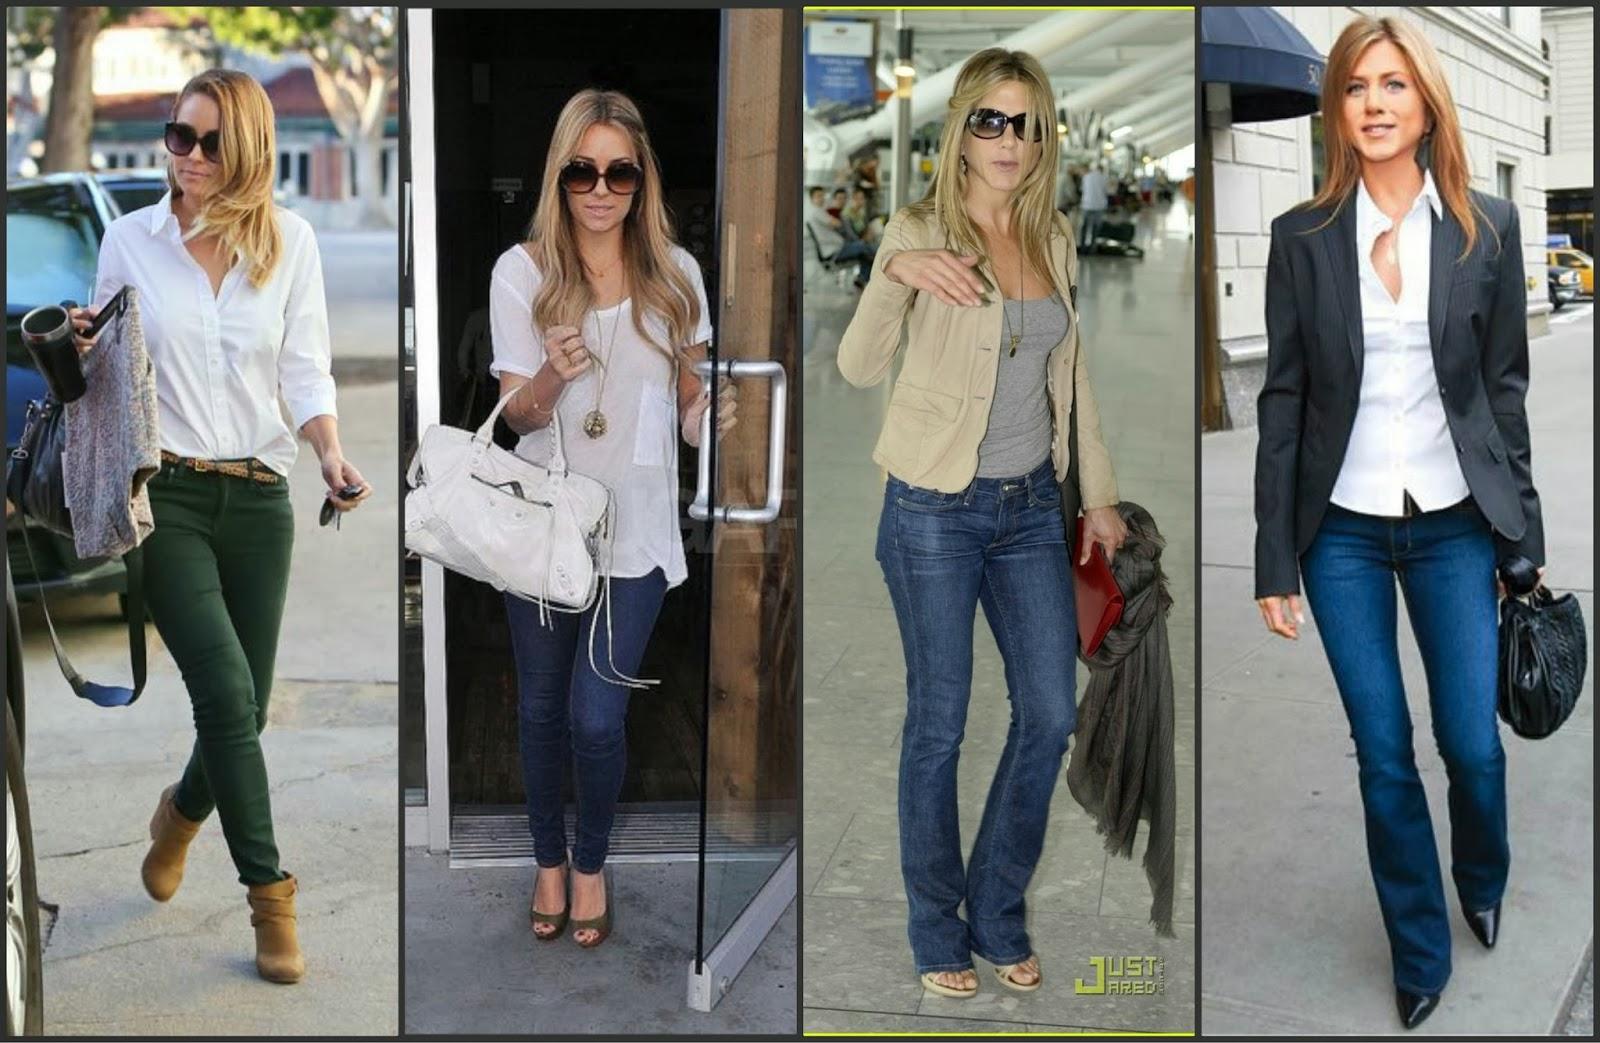 Jennifer Aniston Fashion 2014 The Image Kid Has It